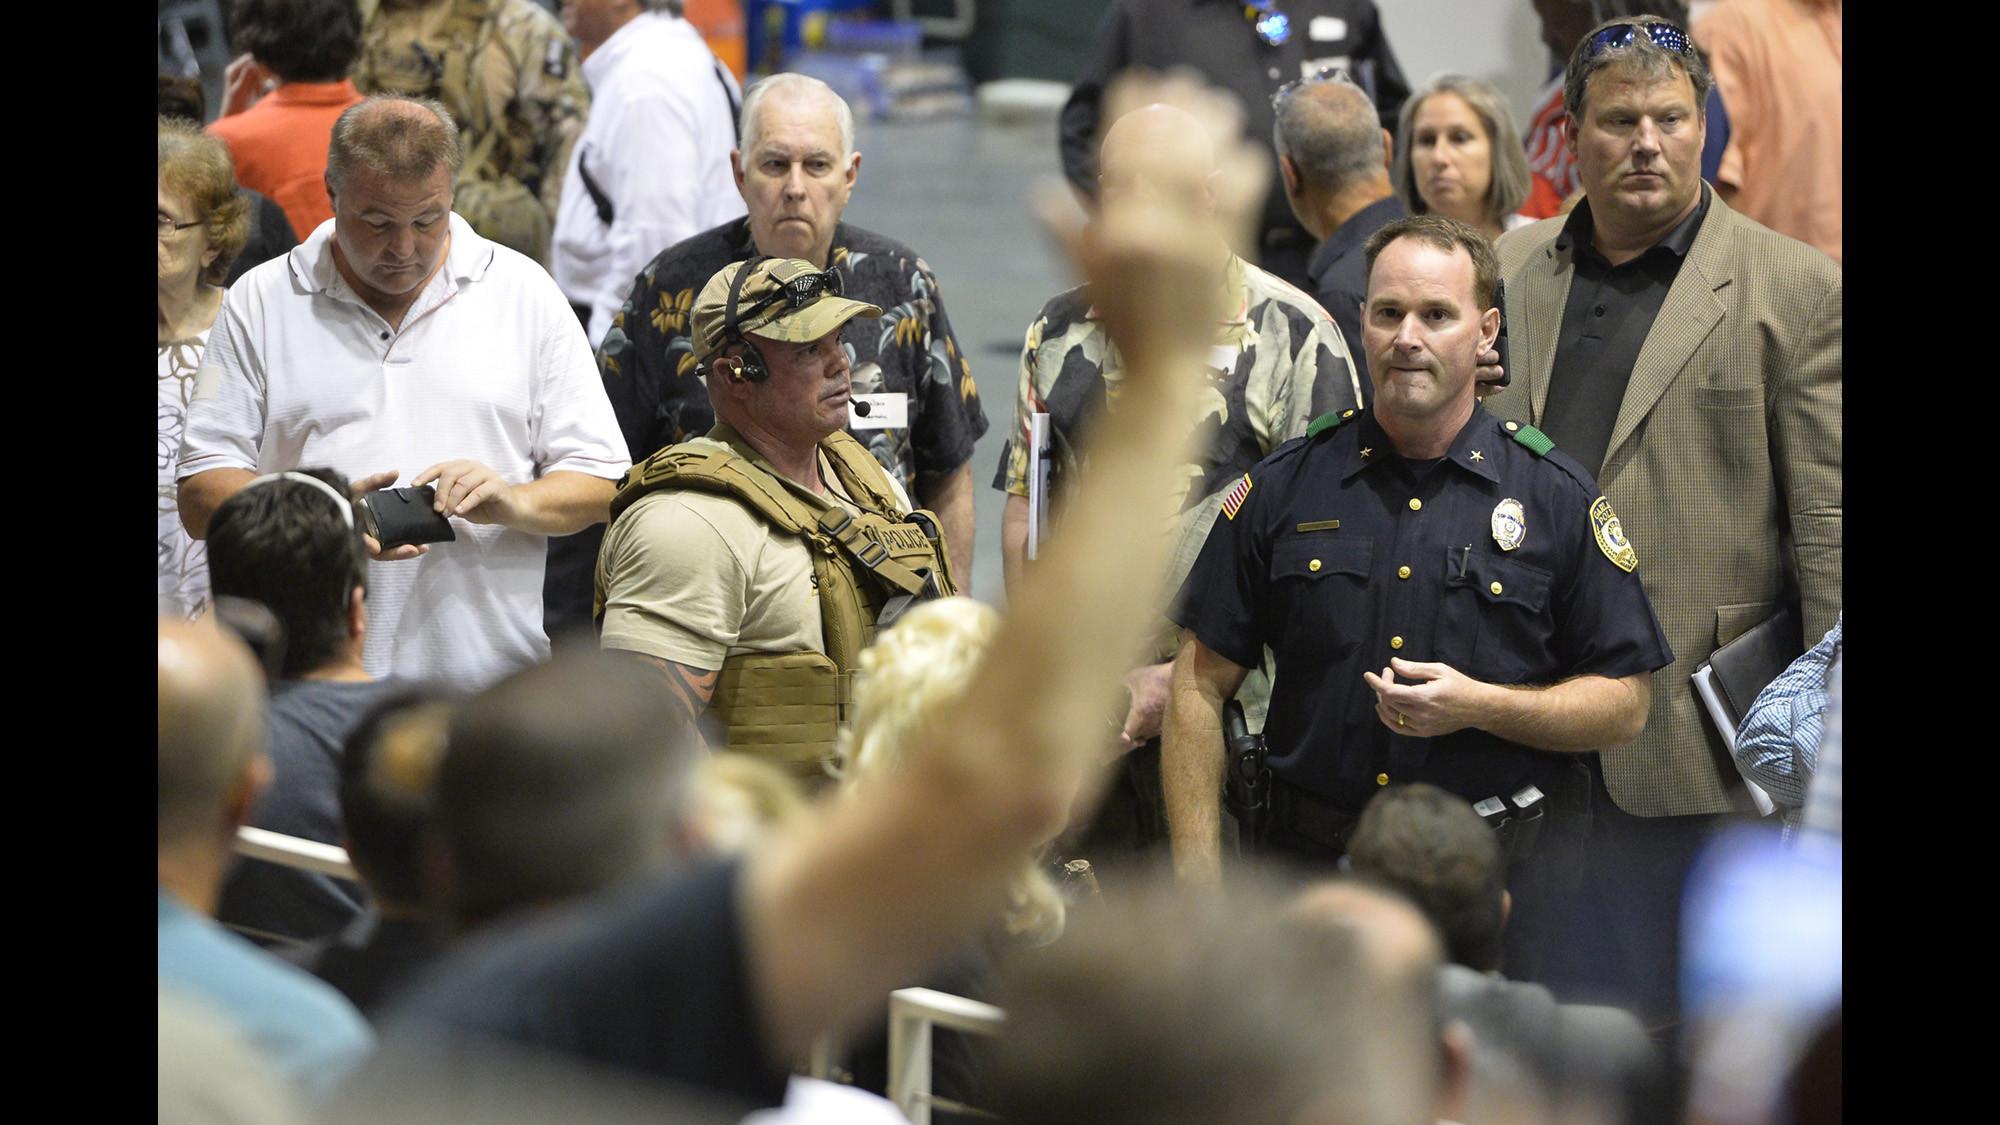 Gunman killed at Muhammad cartoon event was terrorist 'wannabe,' source says